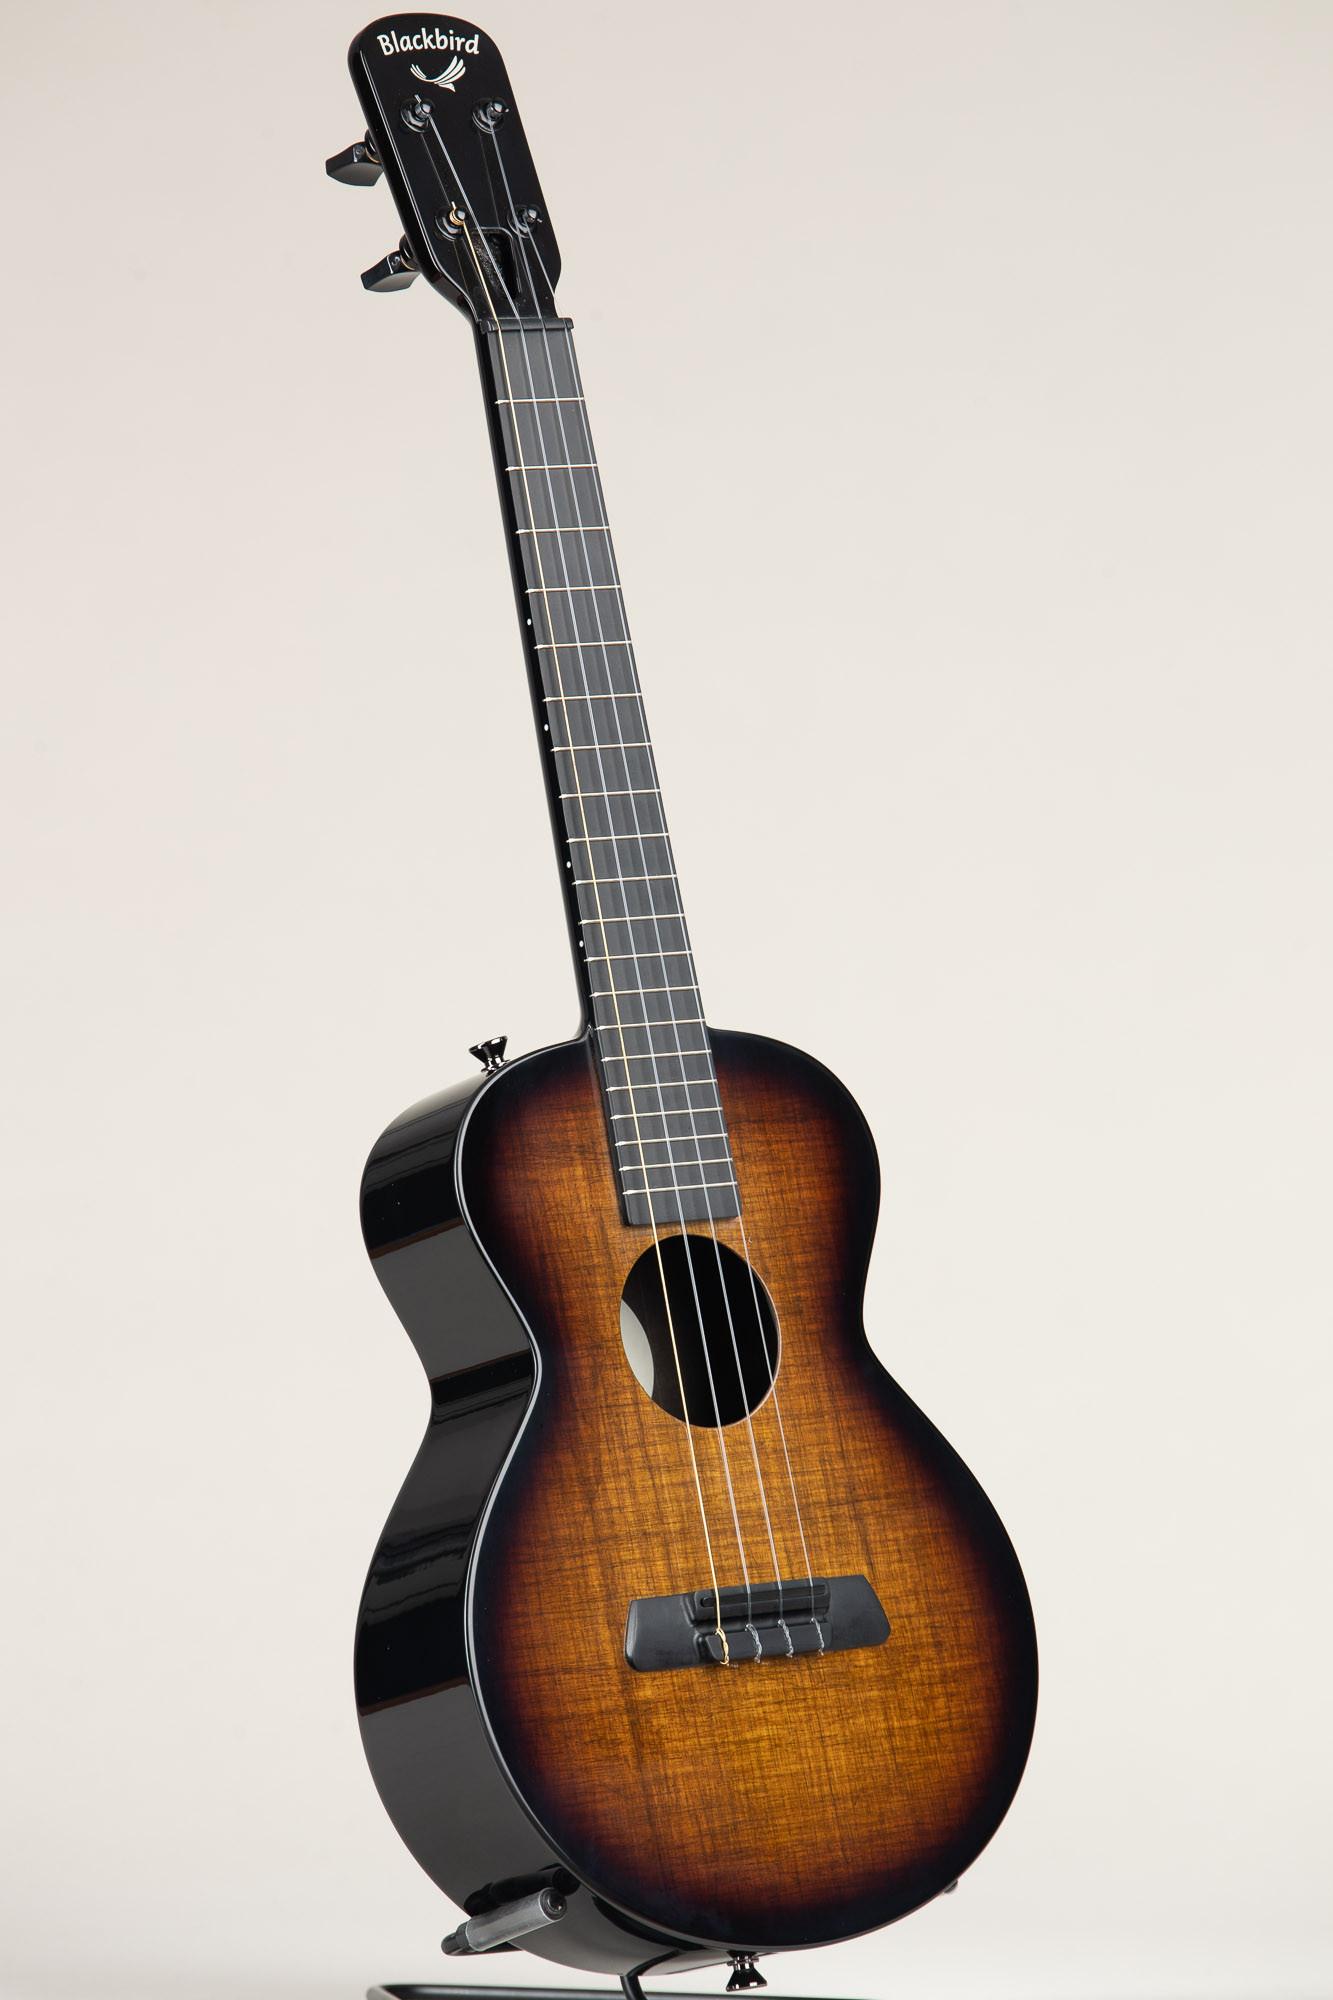 Blackbird EKoa Tenor High Gloss Sunburst (Custom Farallon 3253)